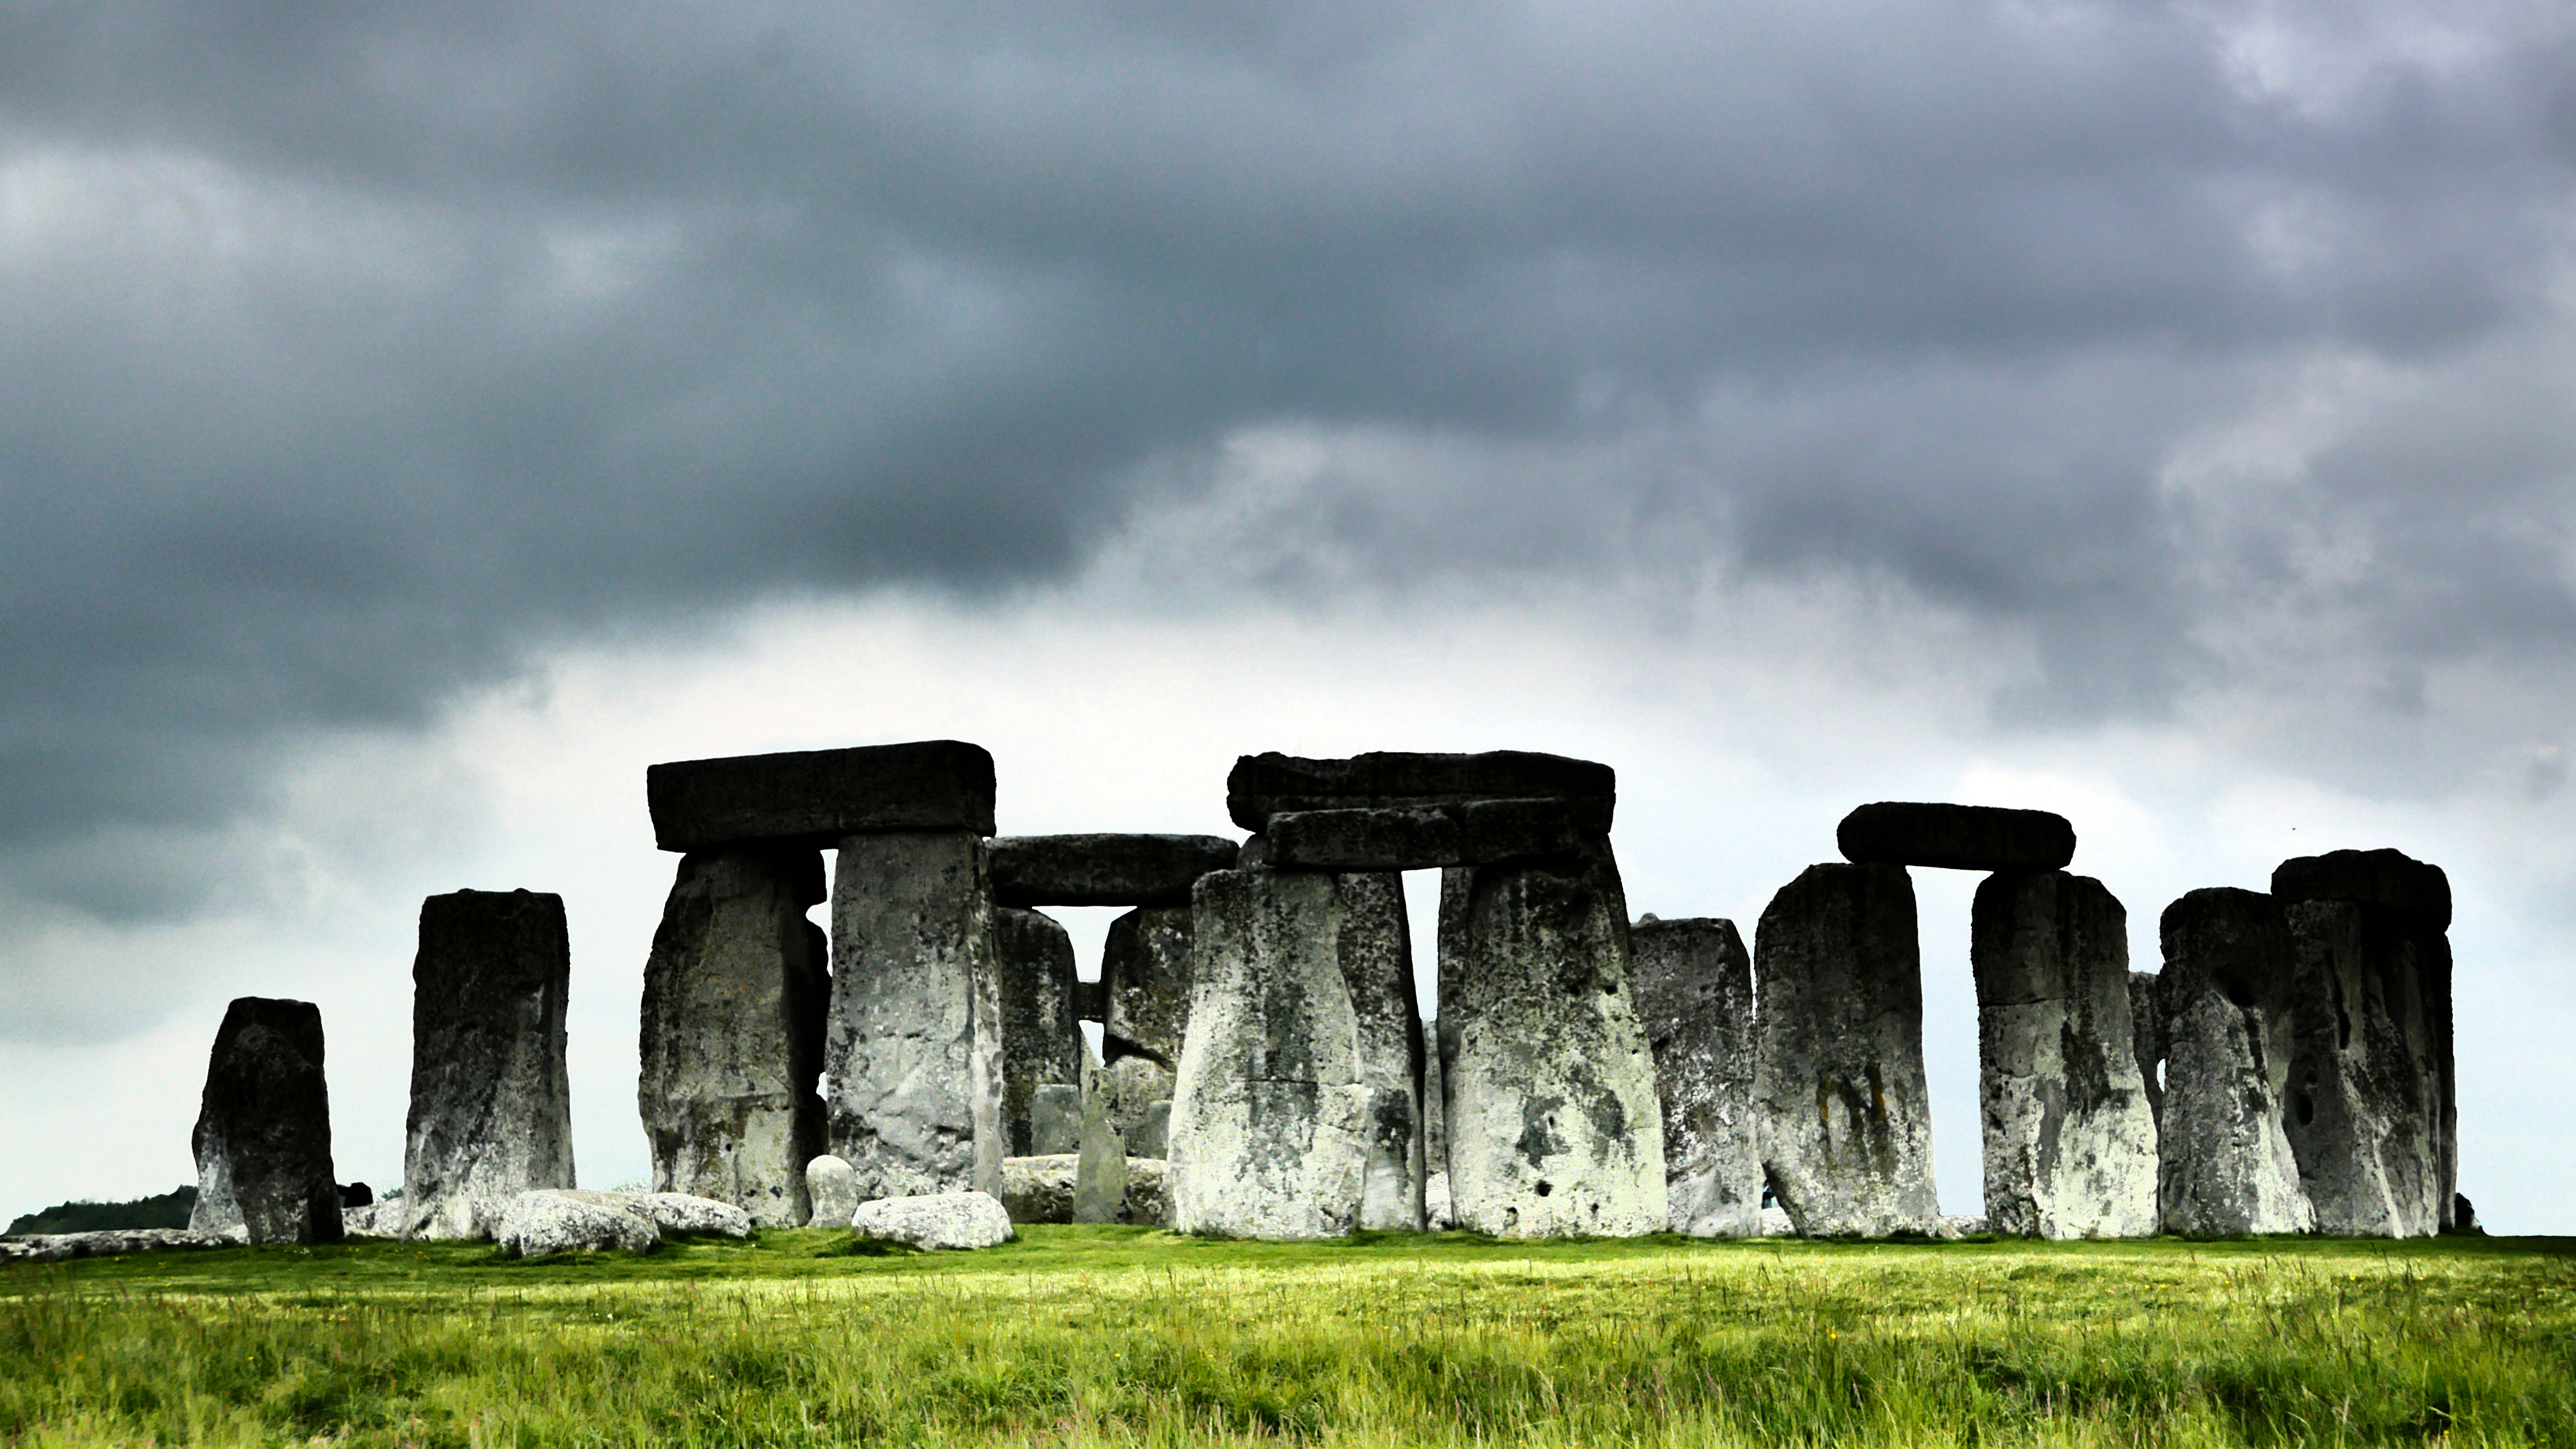 stonehenge moonlight - HD2048×1152